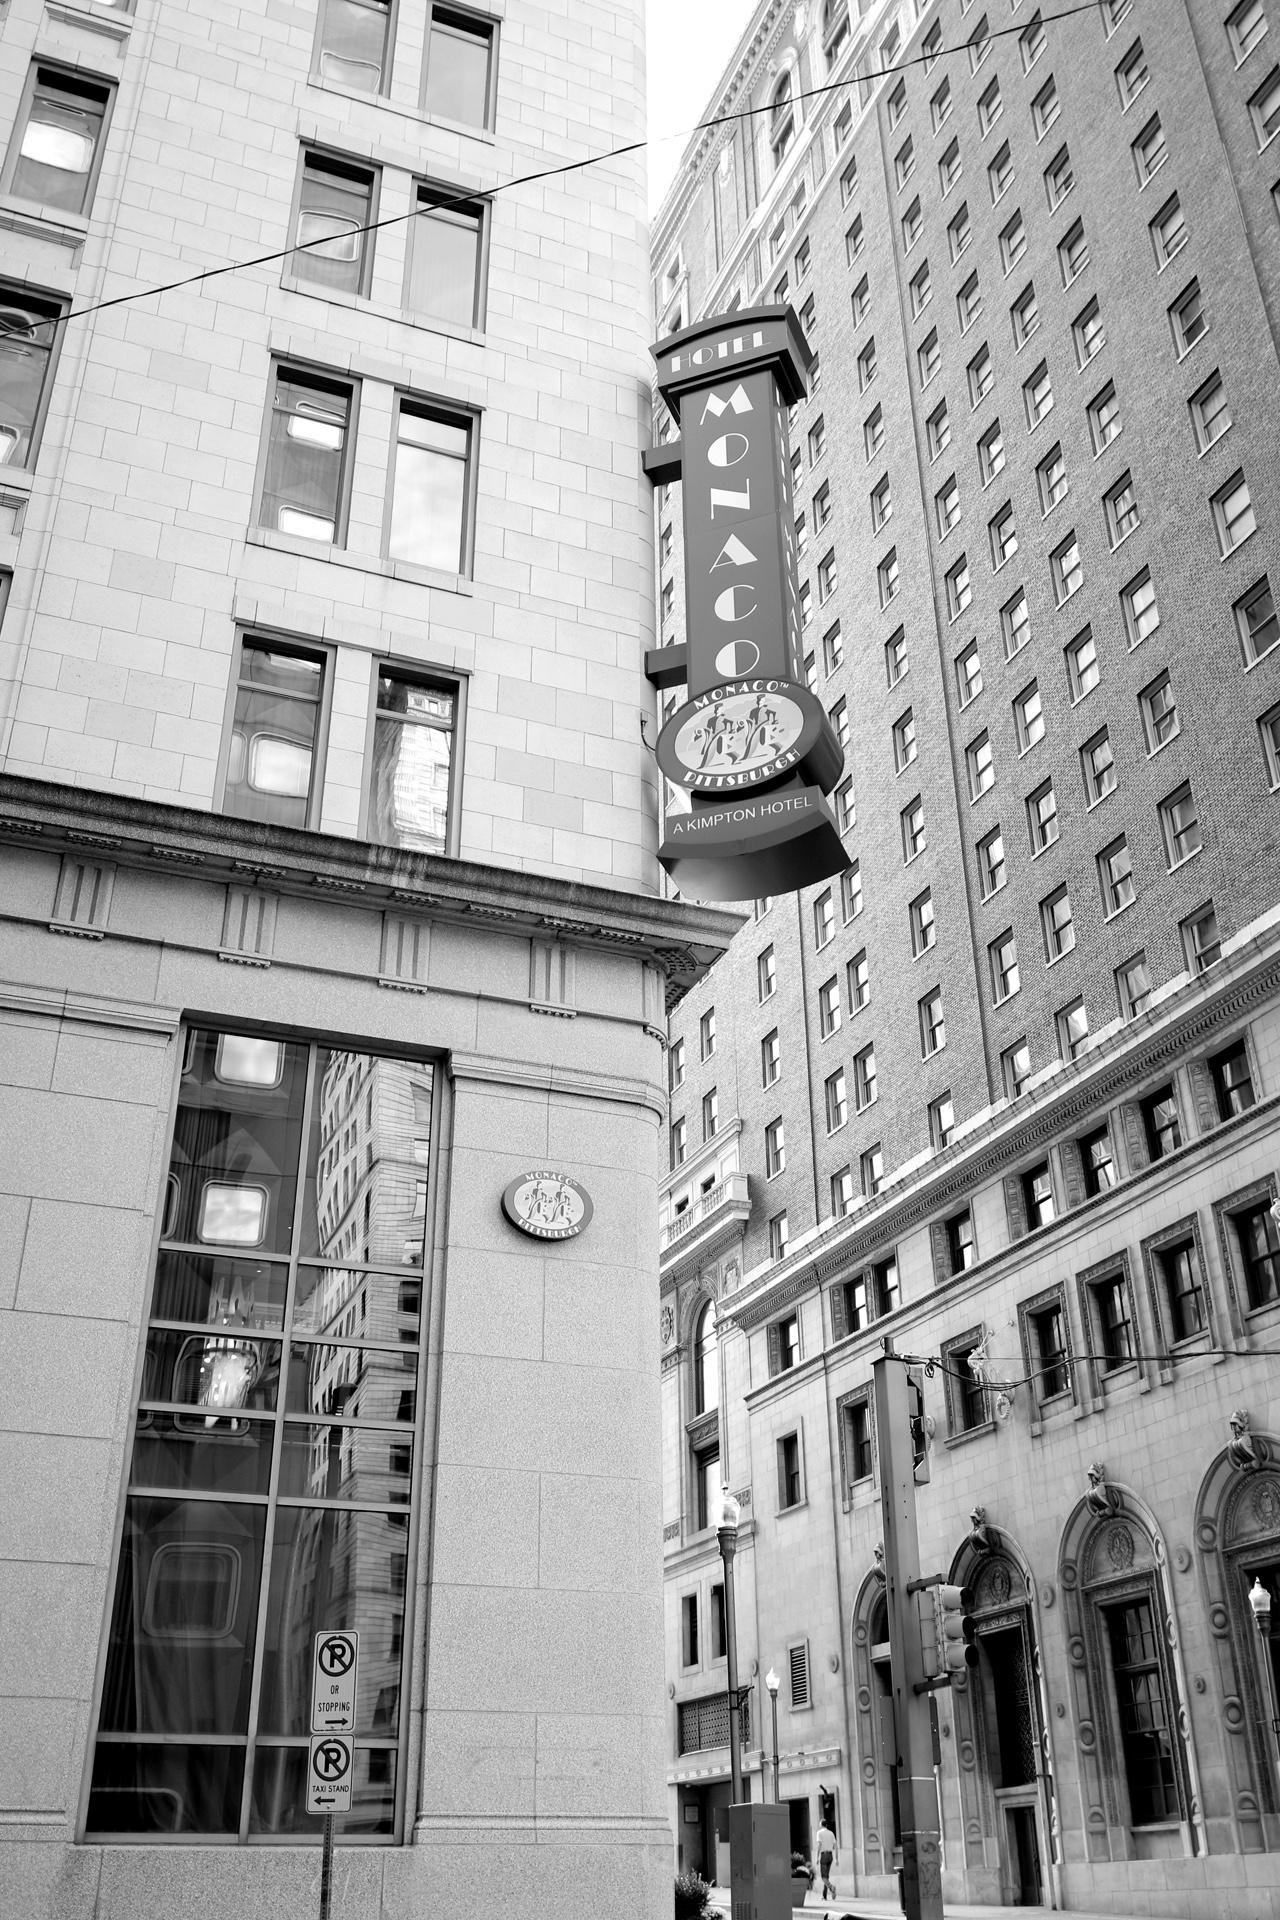 Hotel-Monaco-sign